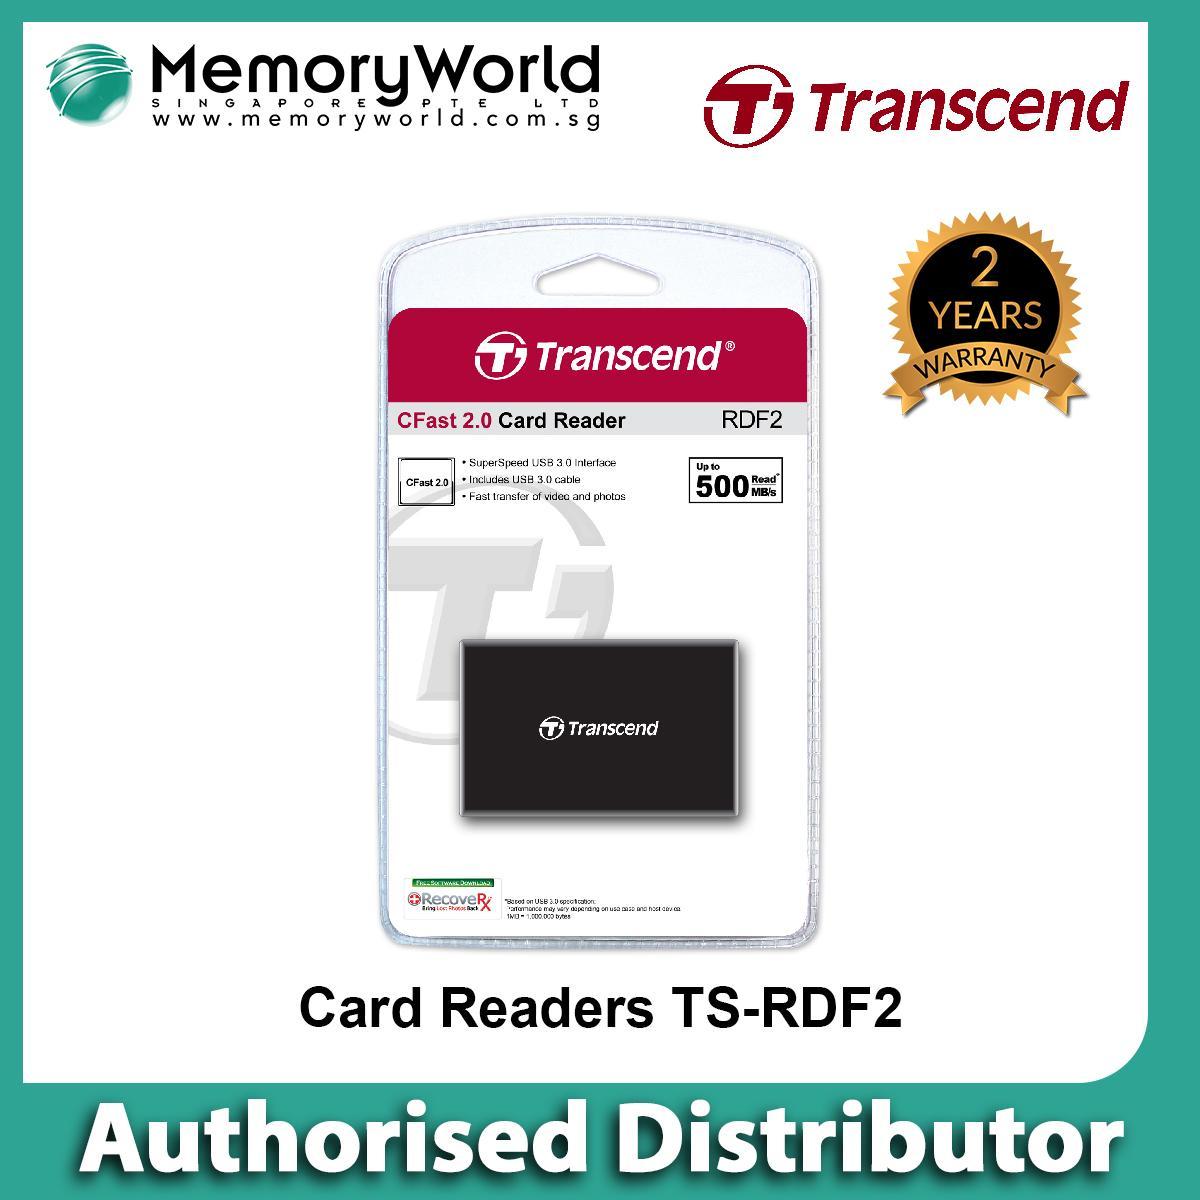 Transcend USB 3.0 CFast 2.0 Reader TS-RDF2 (Black) . Warranty: 2 years. Local Singapore Warranty. **TRANSCEND Authorised Partner **